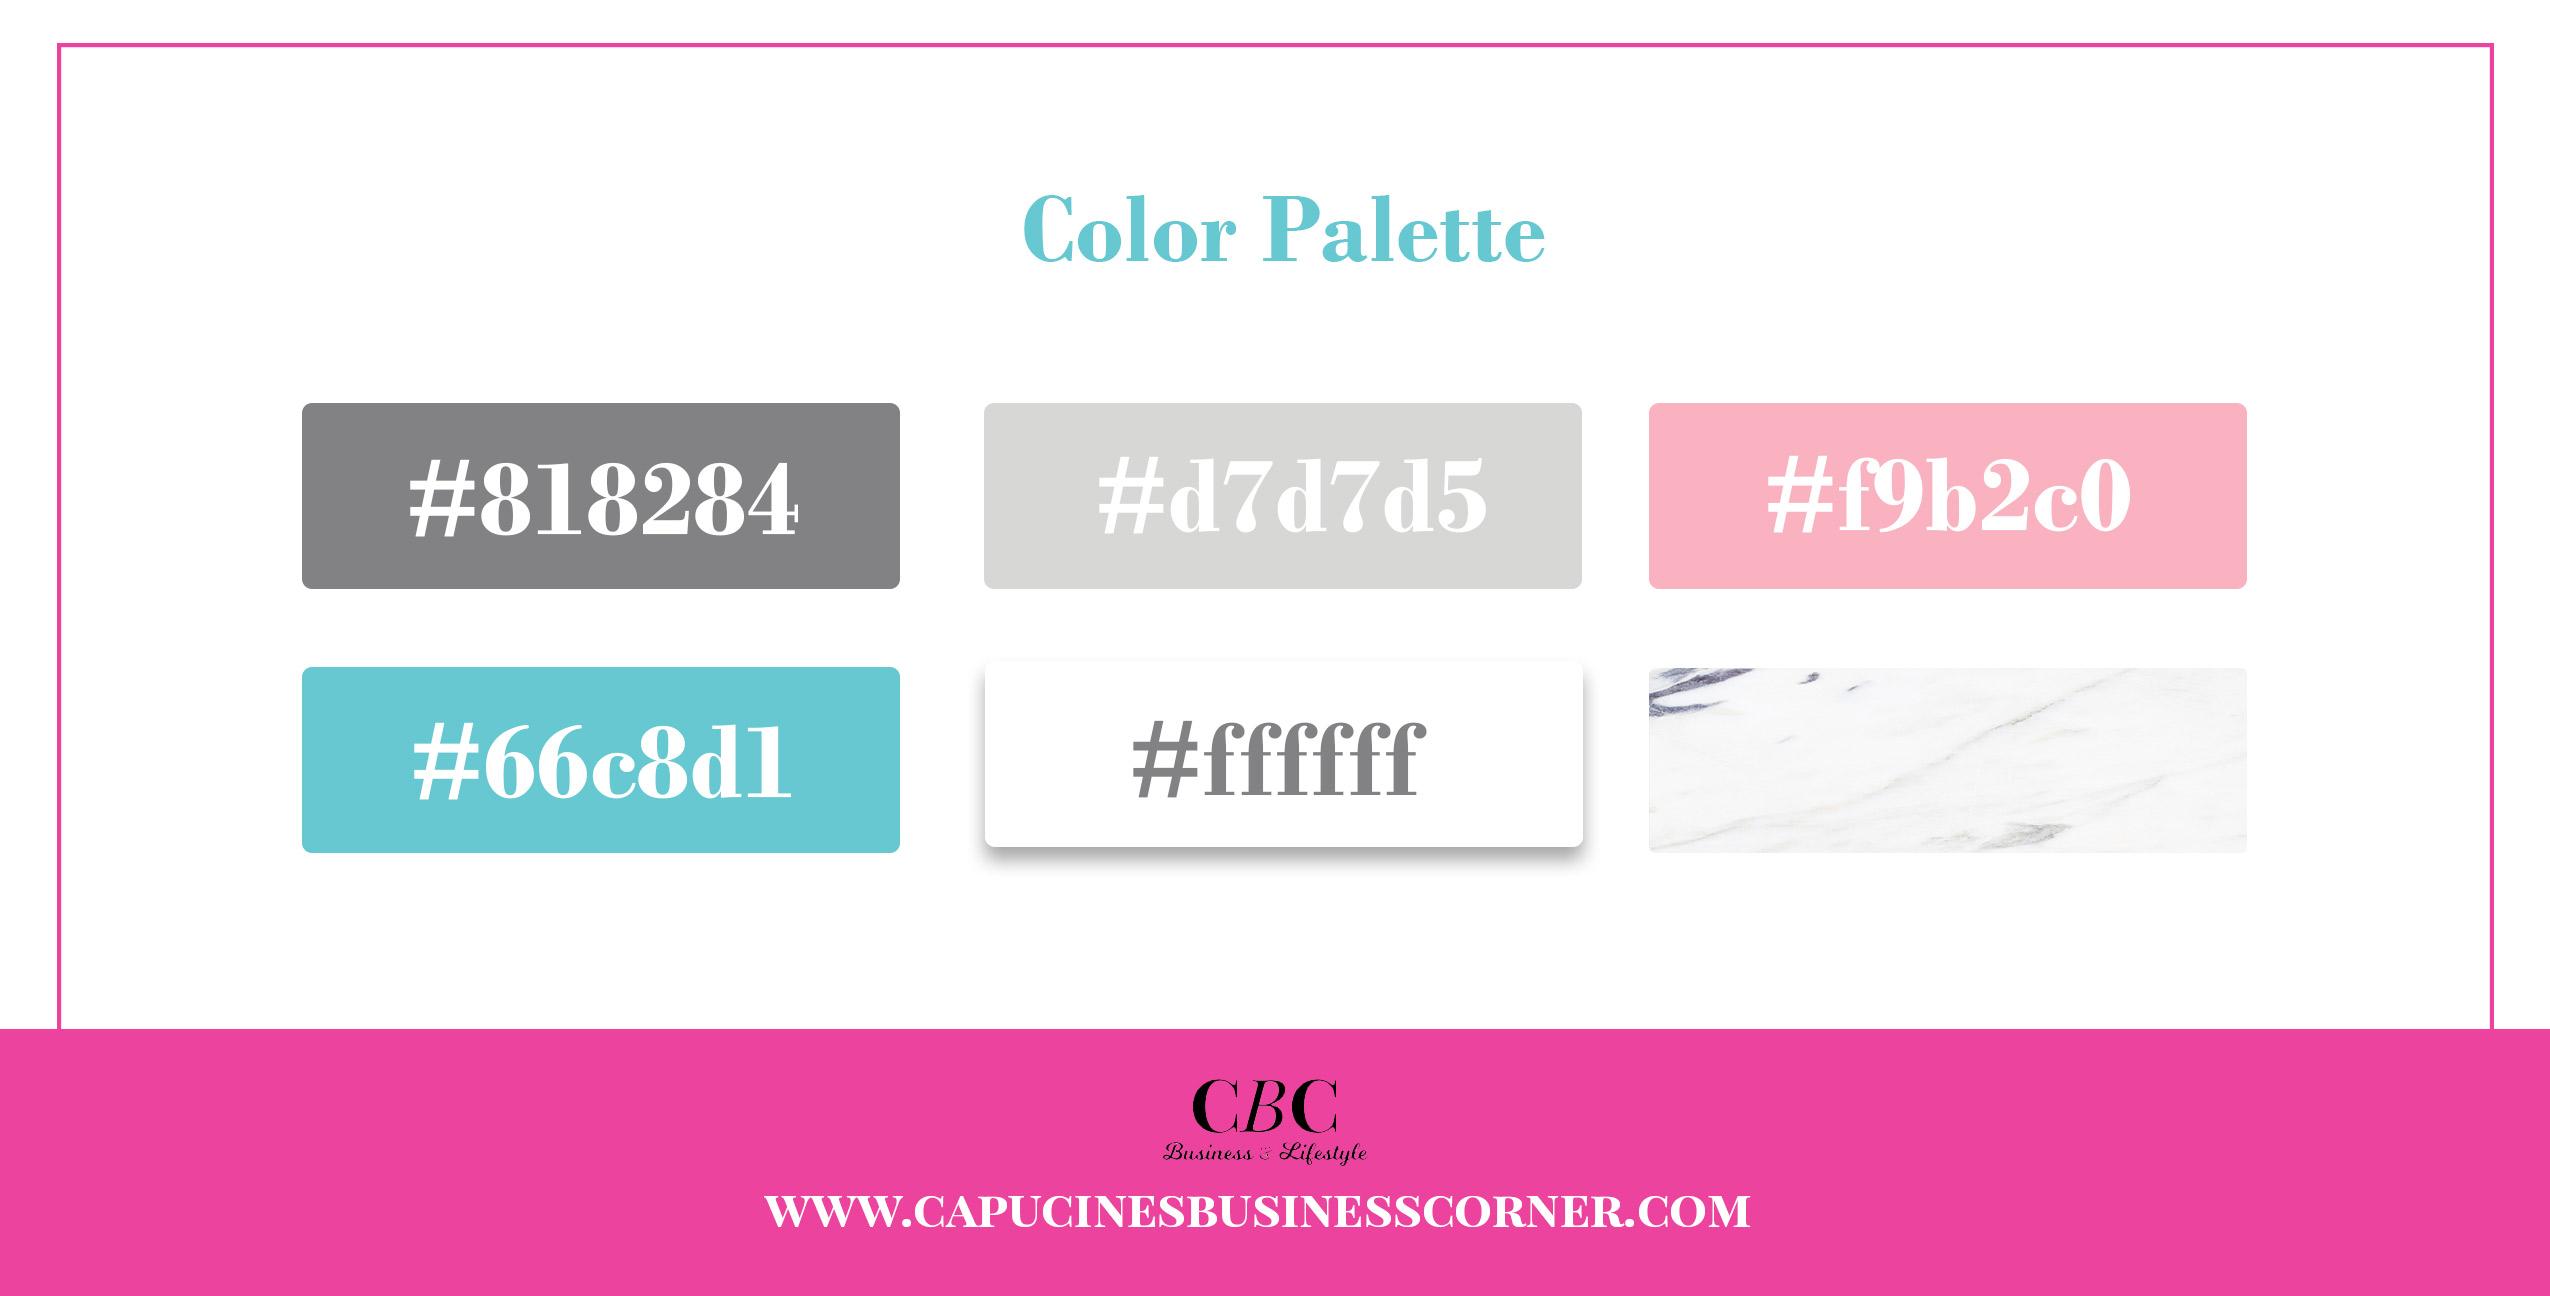 branding board Capucines-Business-Corner ccolor palette